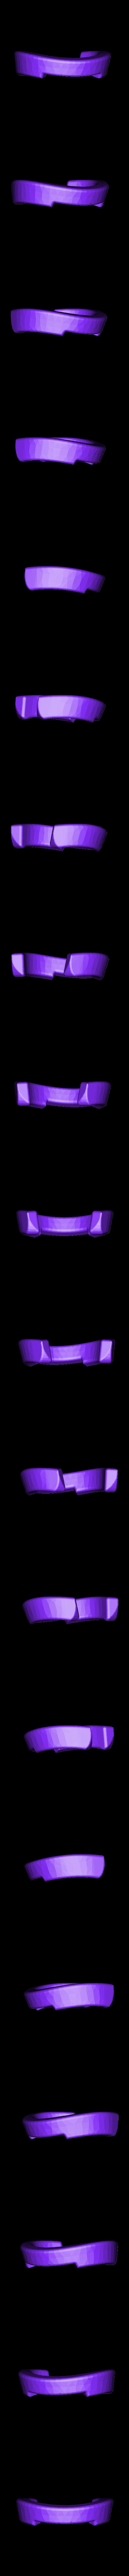 helmet3.stl Download free STL file helmet model with contest • 3D printer object, AlbertKhan3D